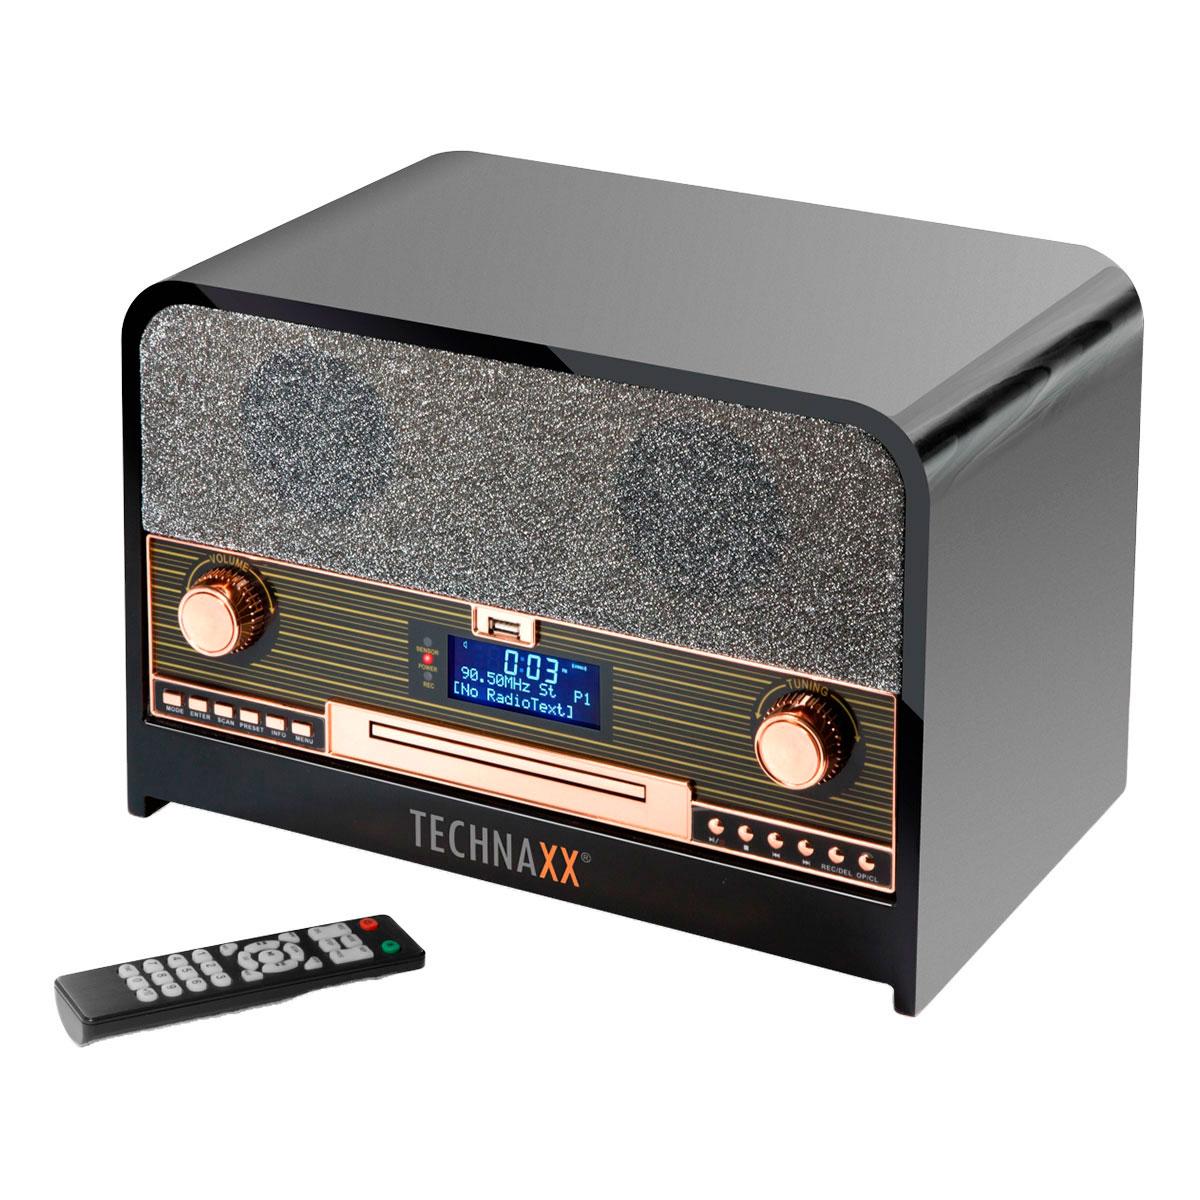 Topmoderne DAB+ radio m/Bluetooth (CD/USB) Sort - Technaxx TX-104 XP-79